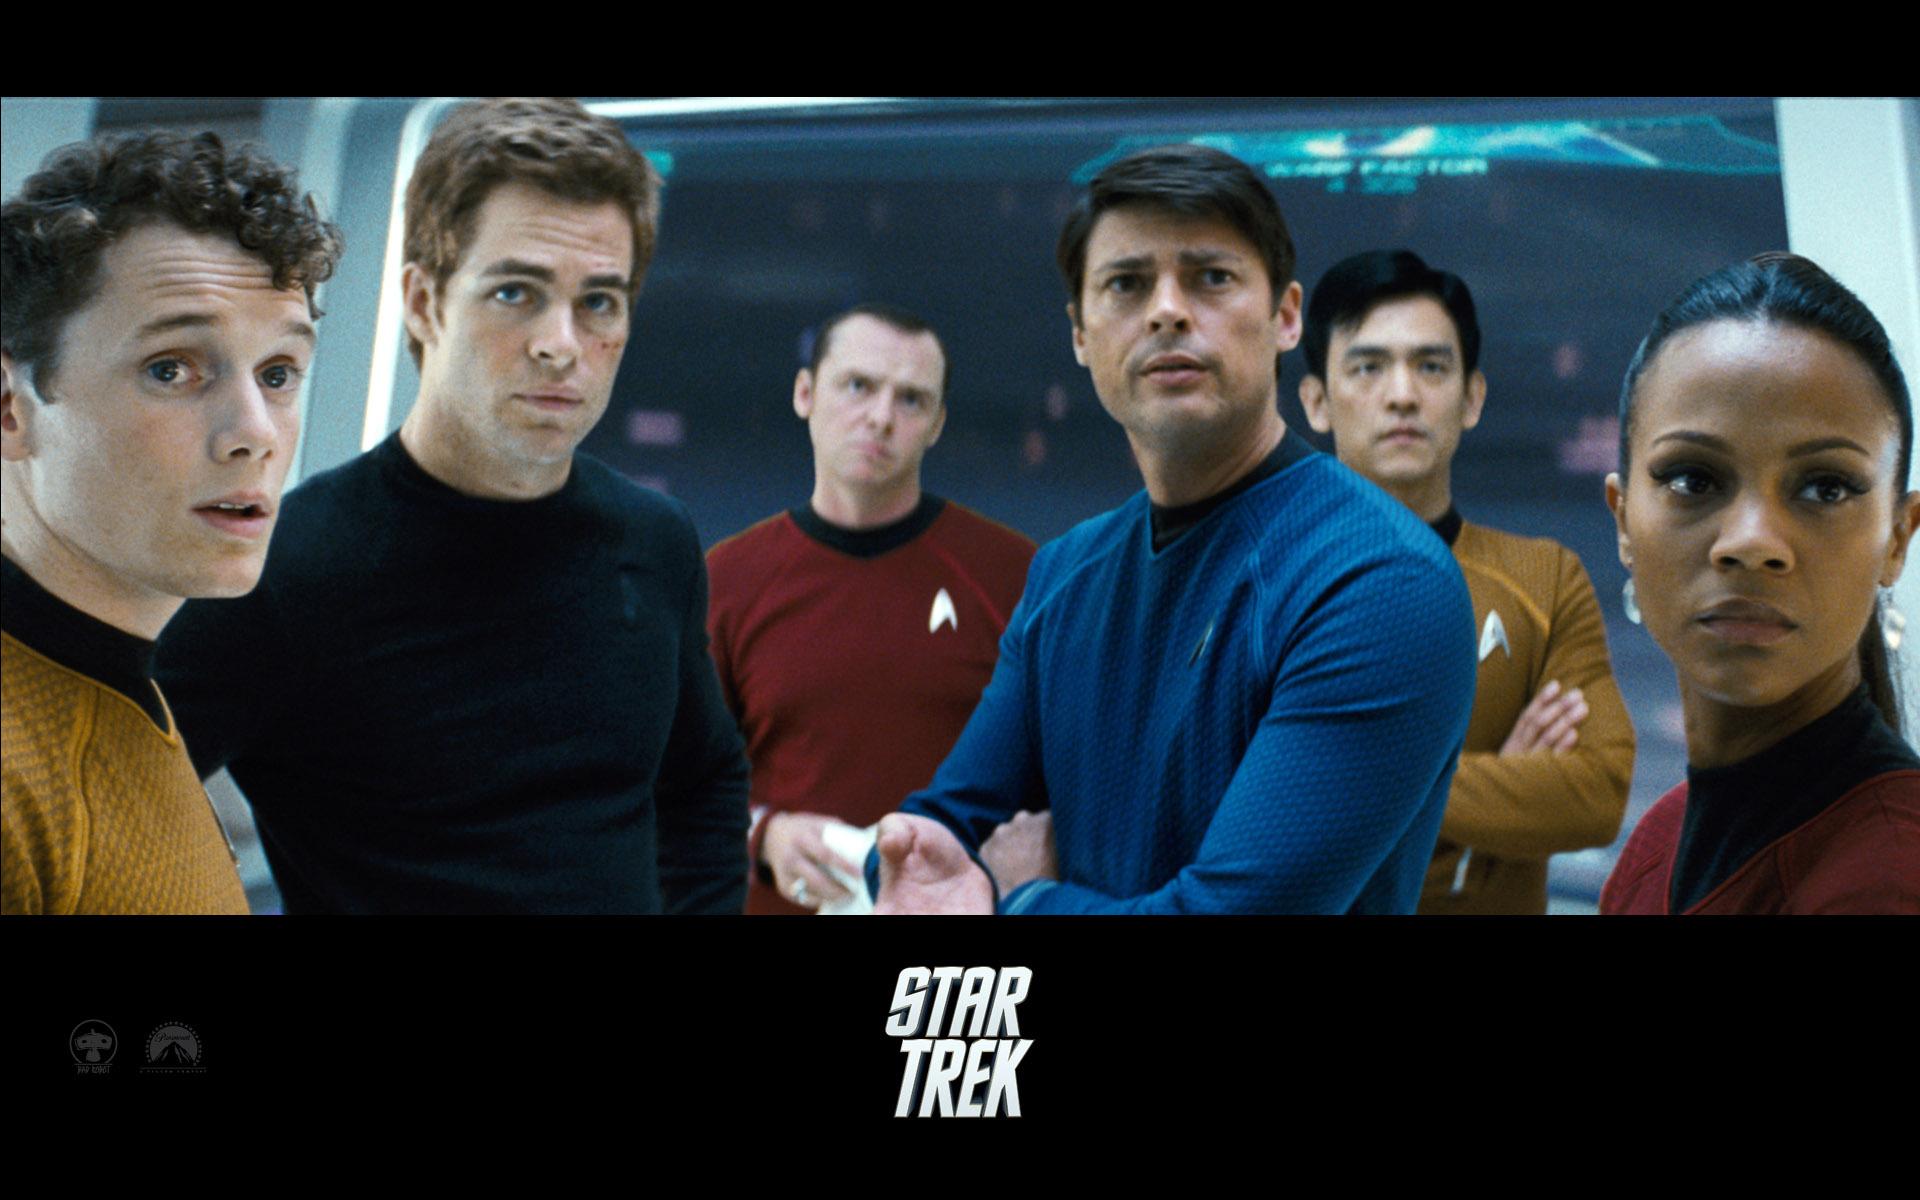 Wallpaper Star Trek Equipe